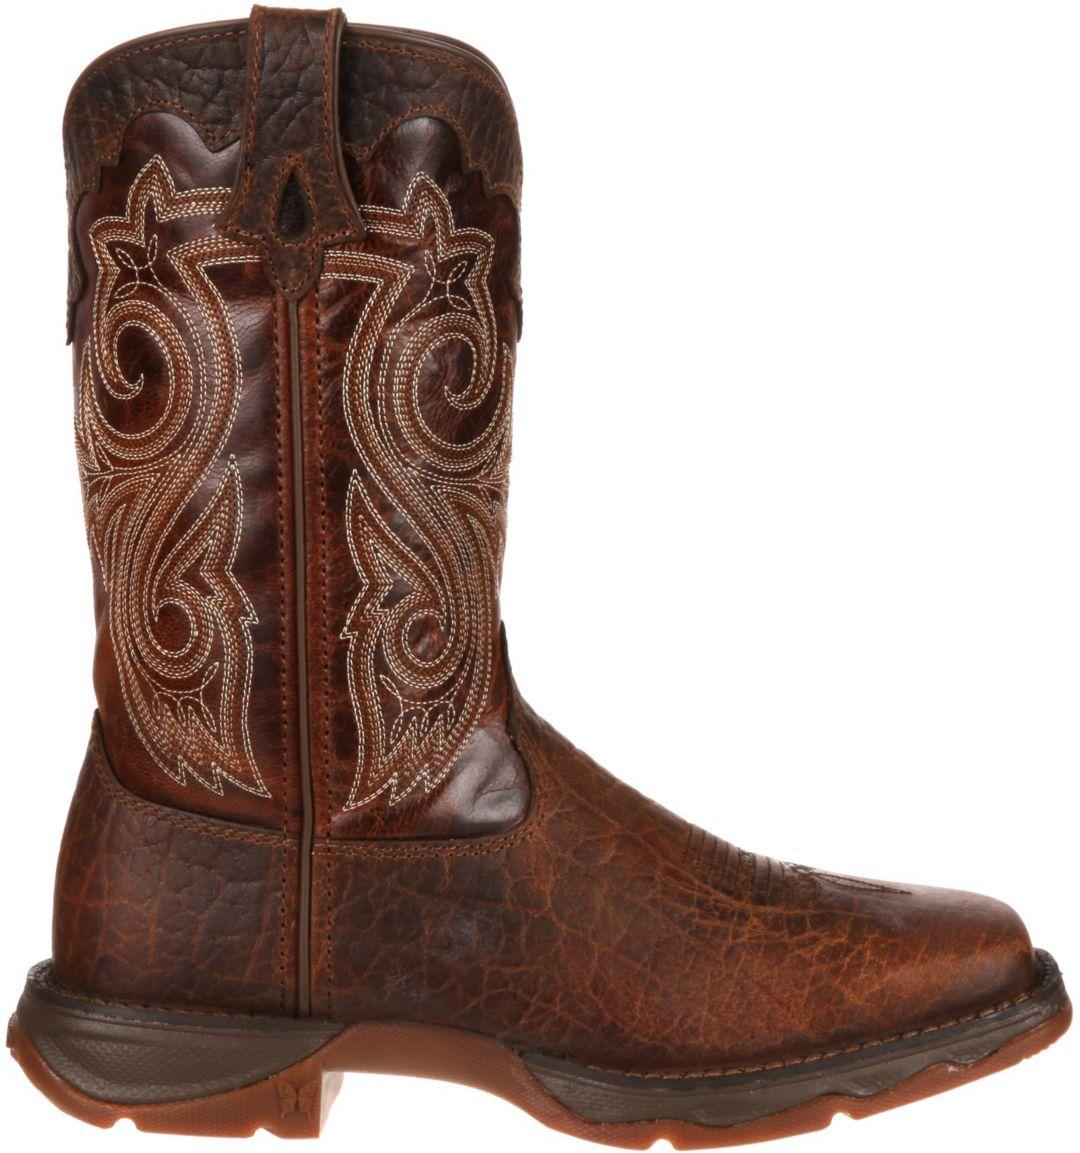 c36beb41610 Durango Women's Lady Rebel Steel Toe Work Boots